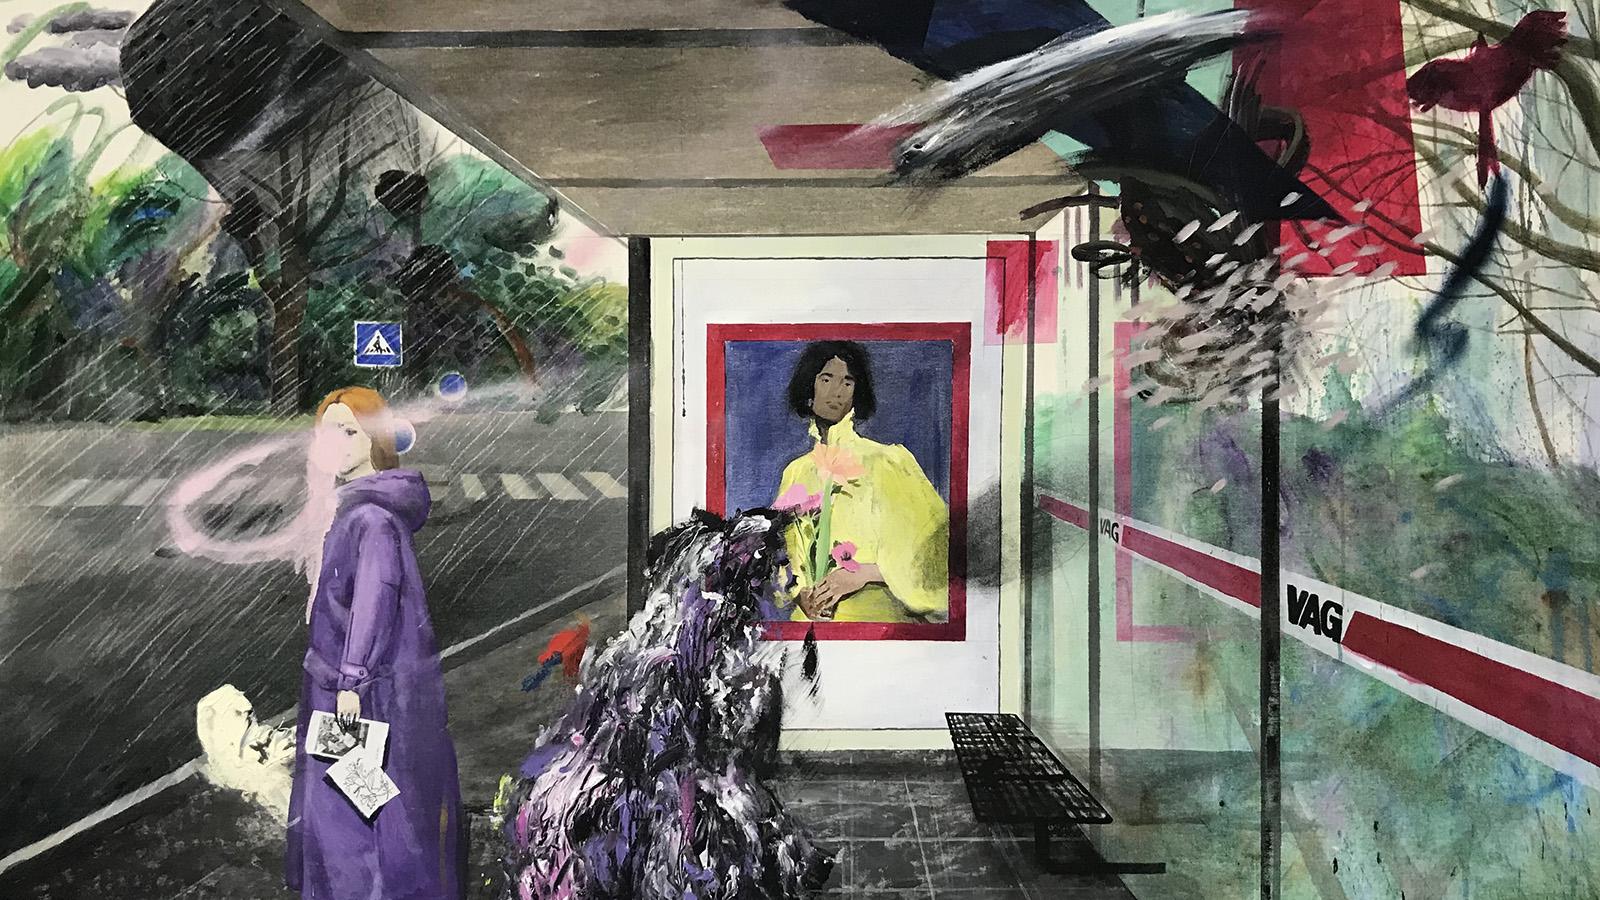 Bingstrasse, 2021, Mixed media on canvas, 159x205cm